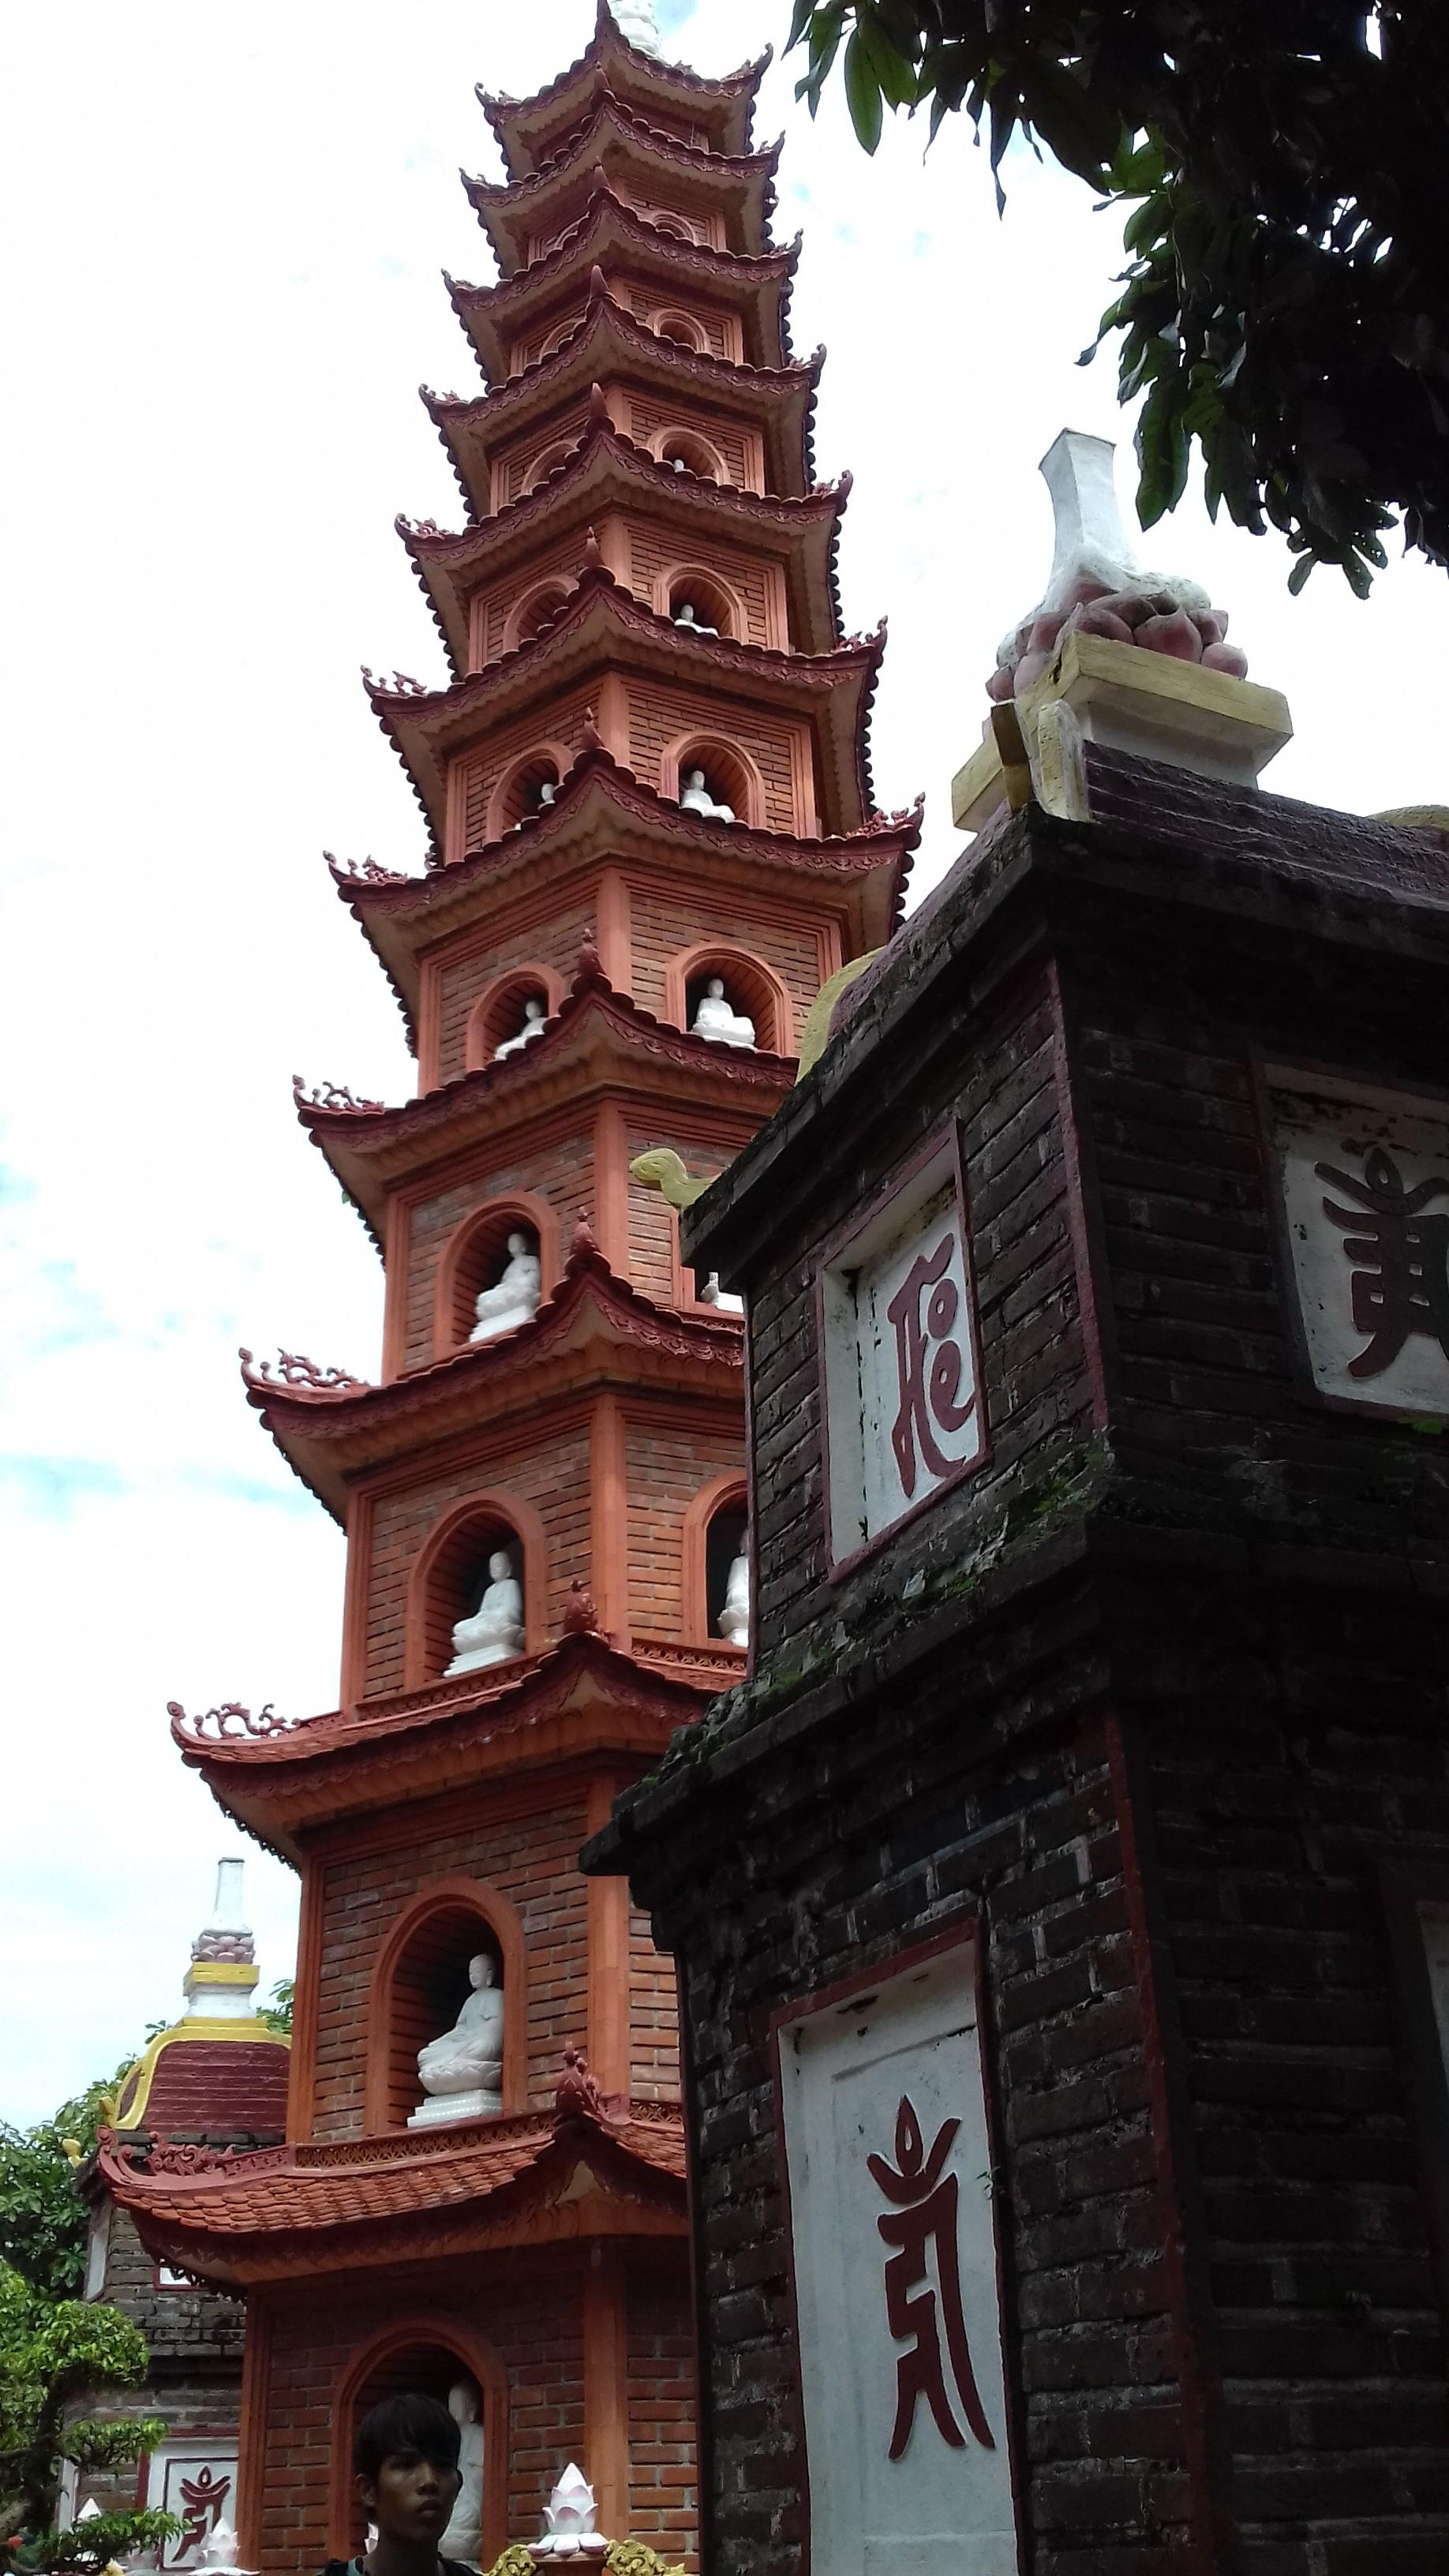 Hanoi's oldest pagoda, Vietnam